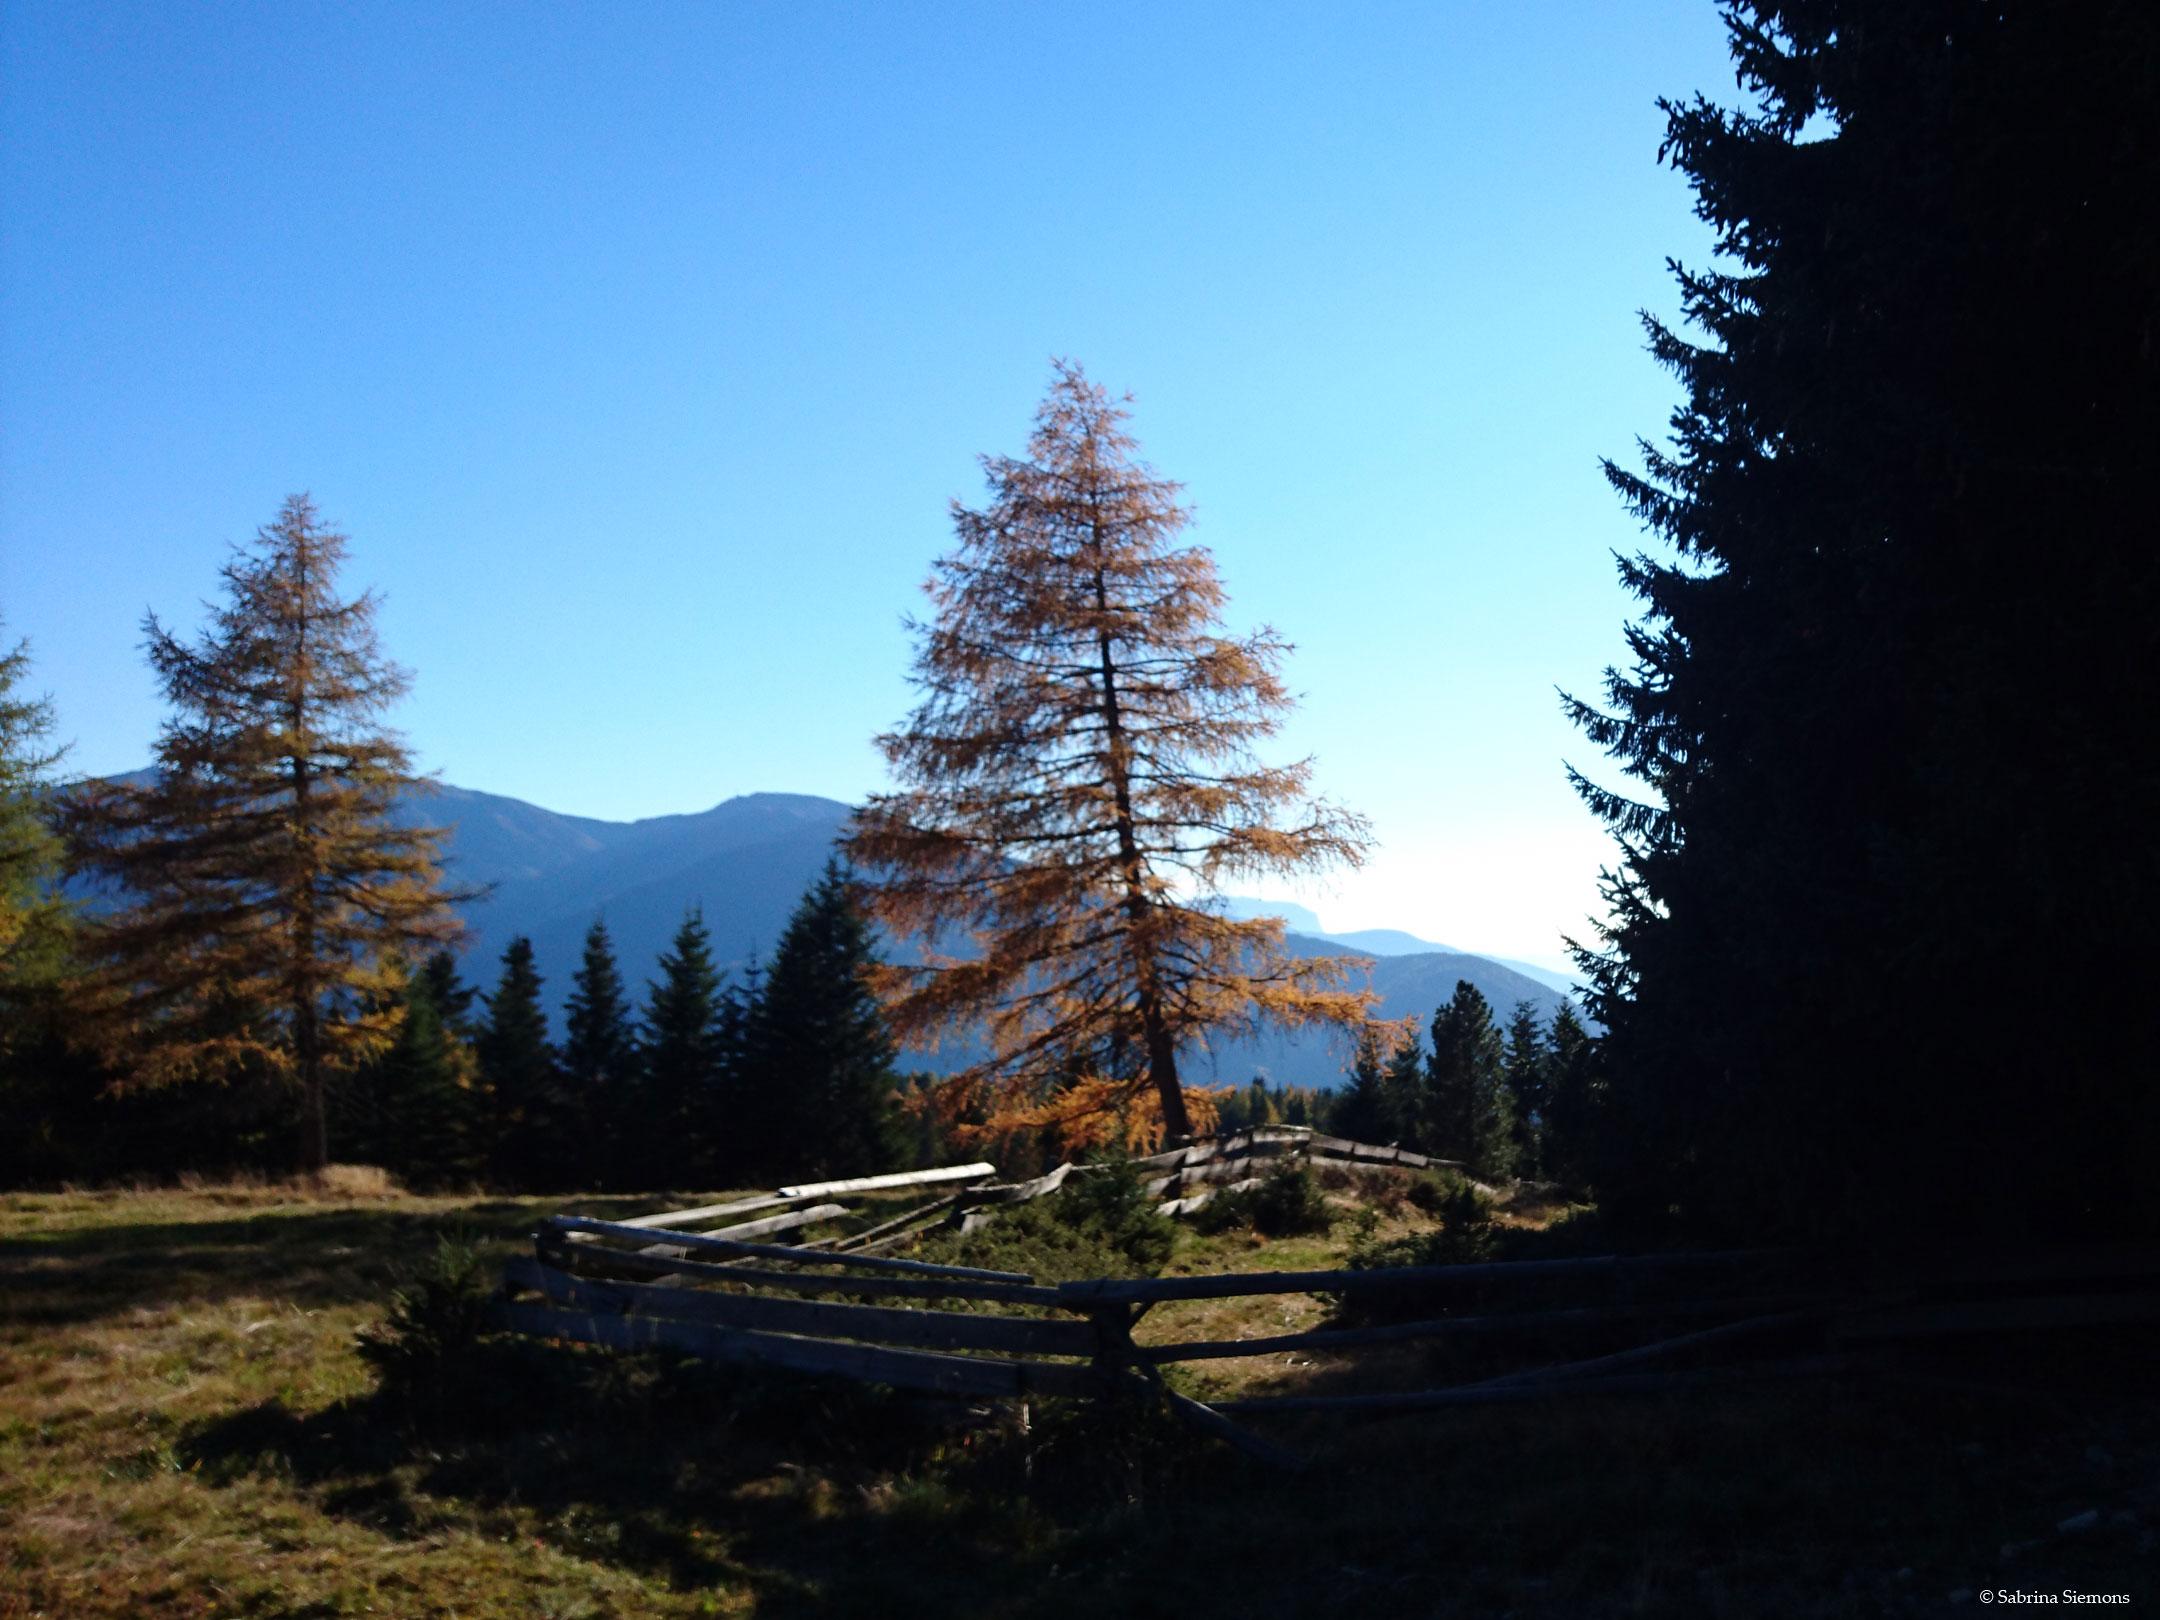 Wheelchair-Tours-Wheelchair-Rodenecker-Alm-View-Tree